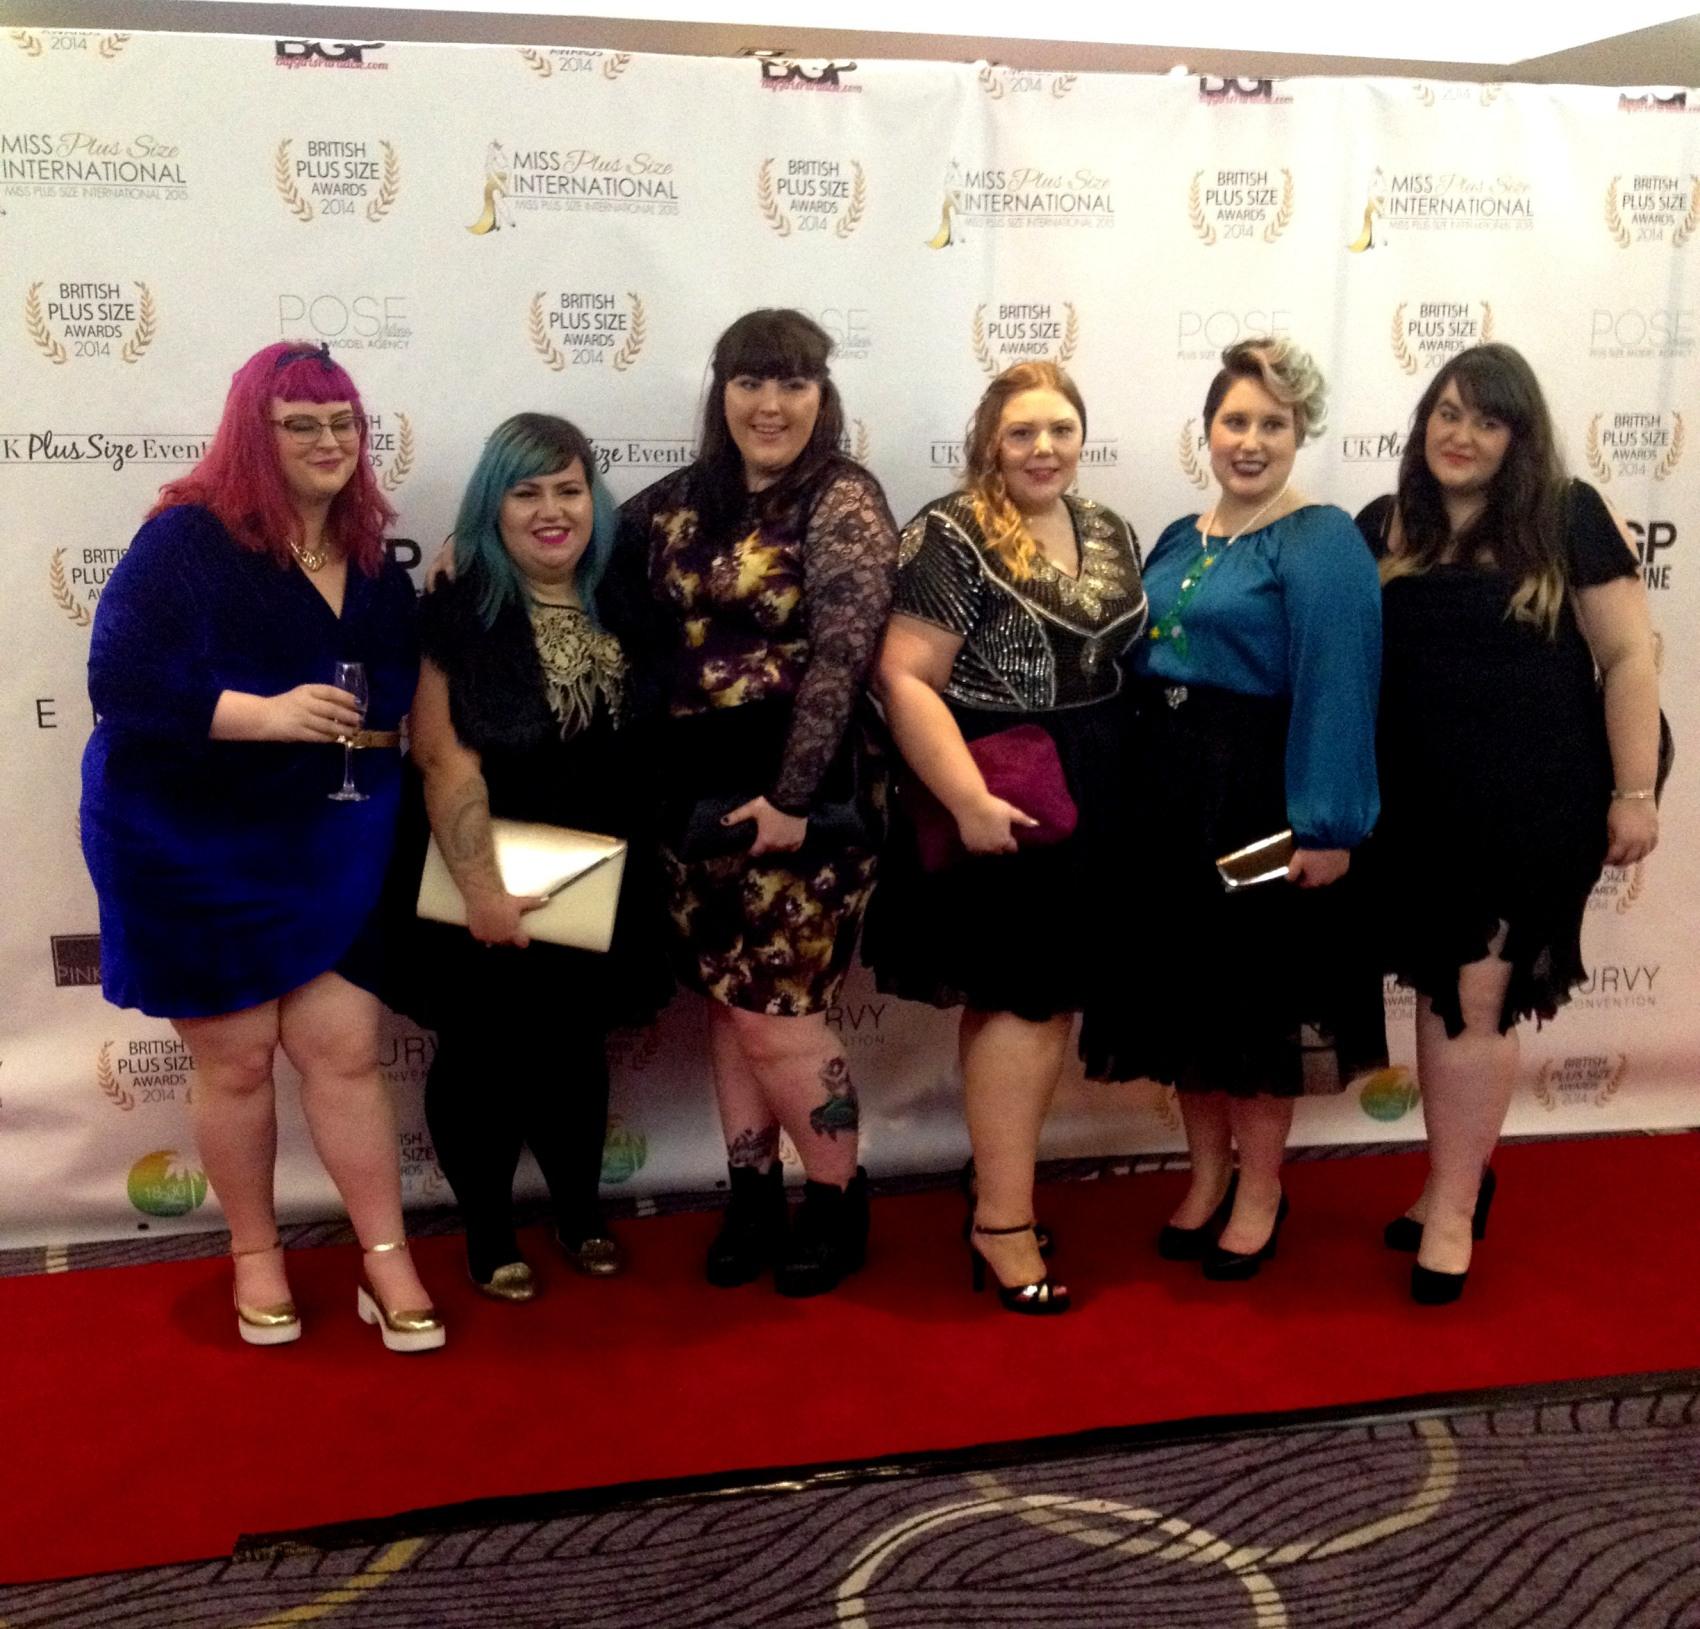 Plus Size Bloggers - British Plus Size Awards